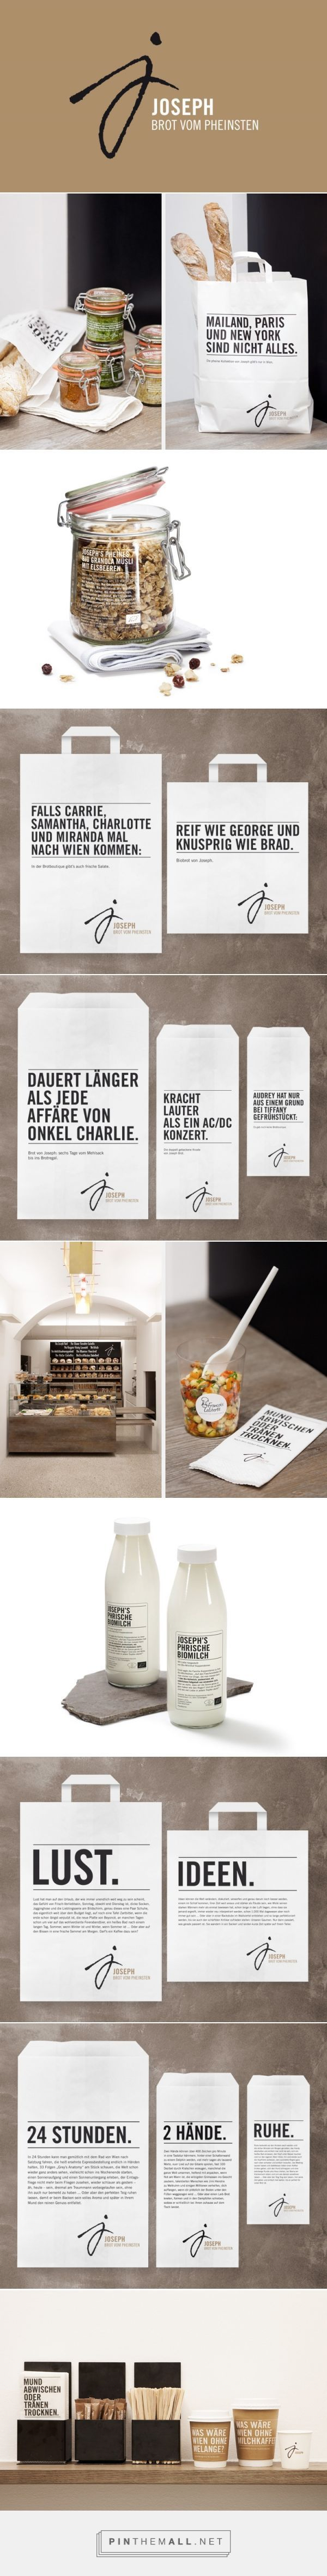 940 best Packaging images on Pinterest | Design packaging, Drinks ...